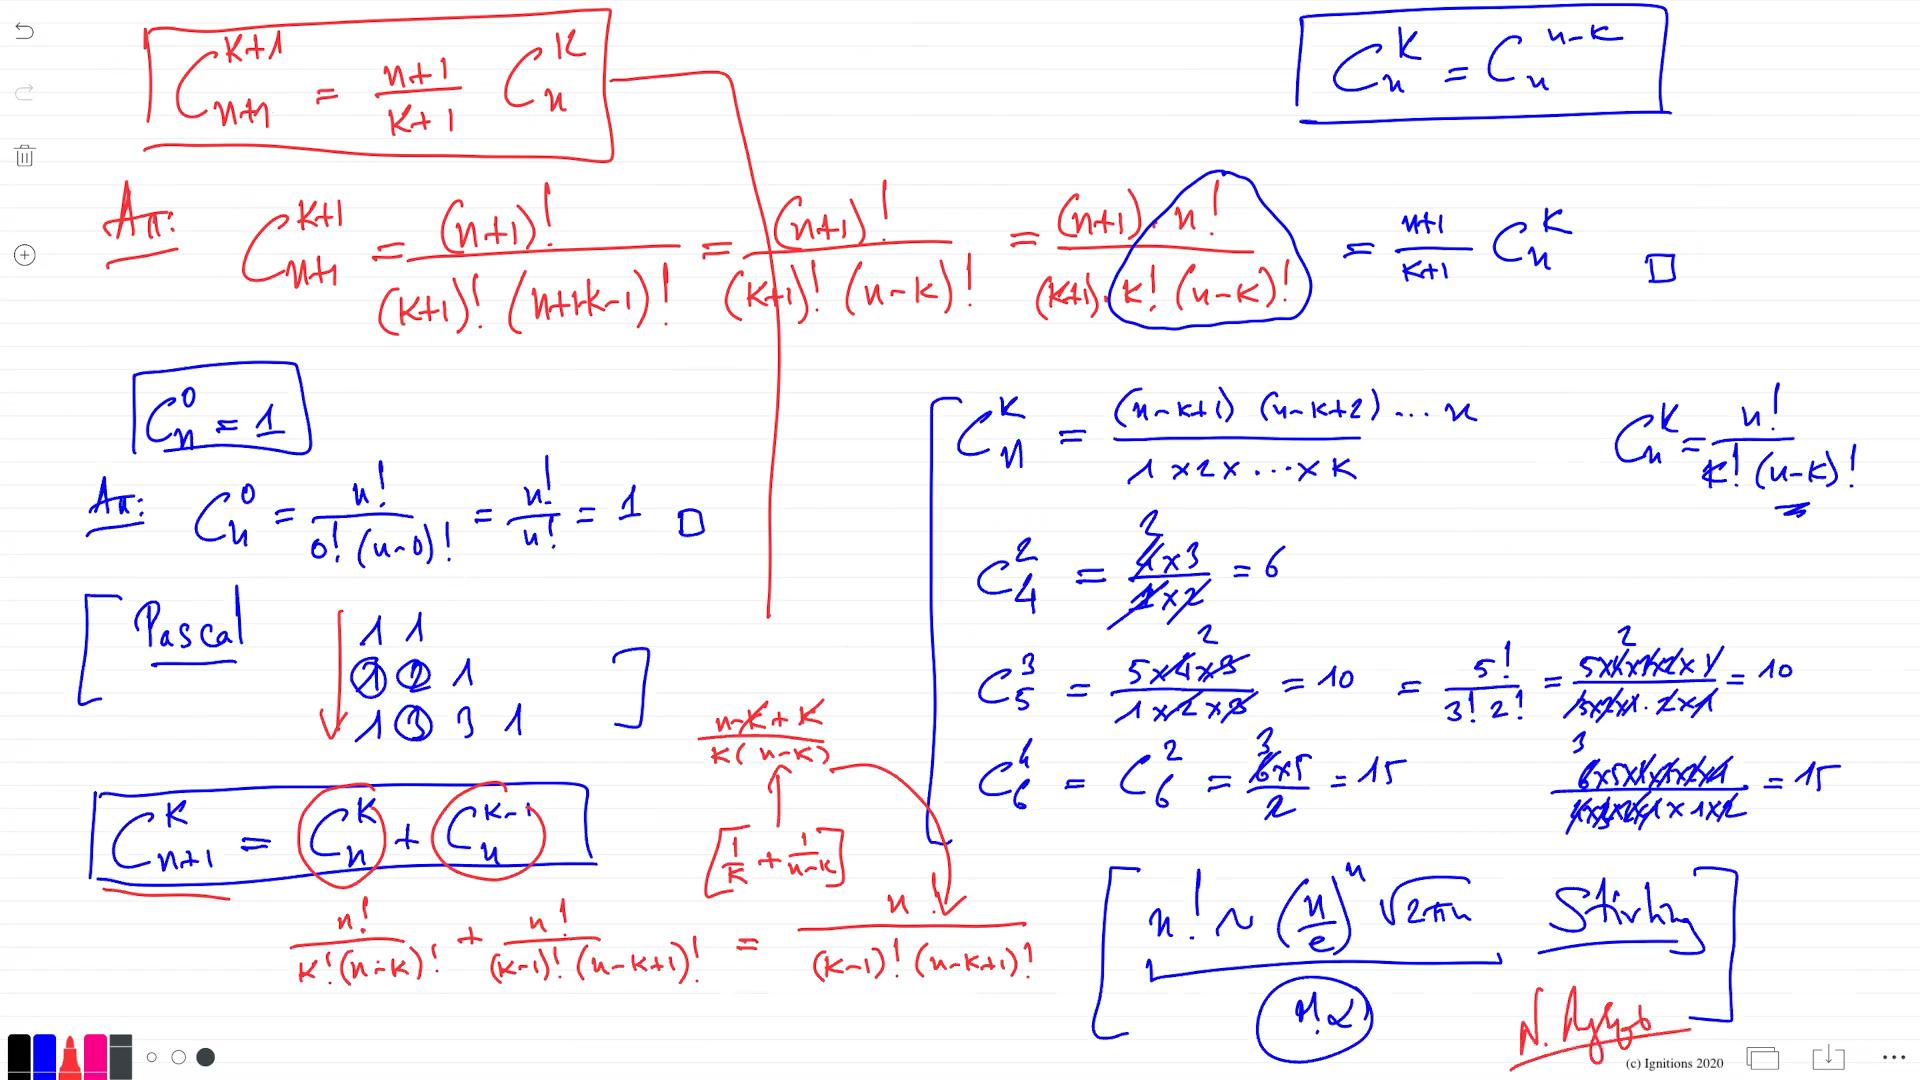 55848 - e-Μάθημα II: Συνδυασμοί, Διατάξεις, Pascal, Newton, Leibniz. (Dessin)